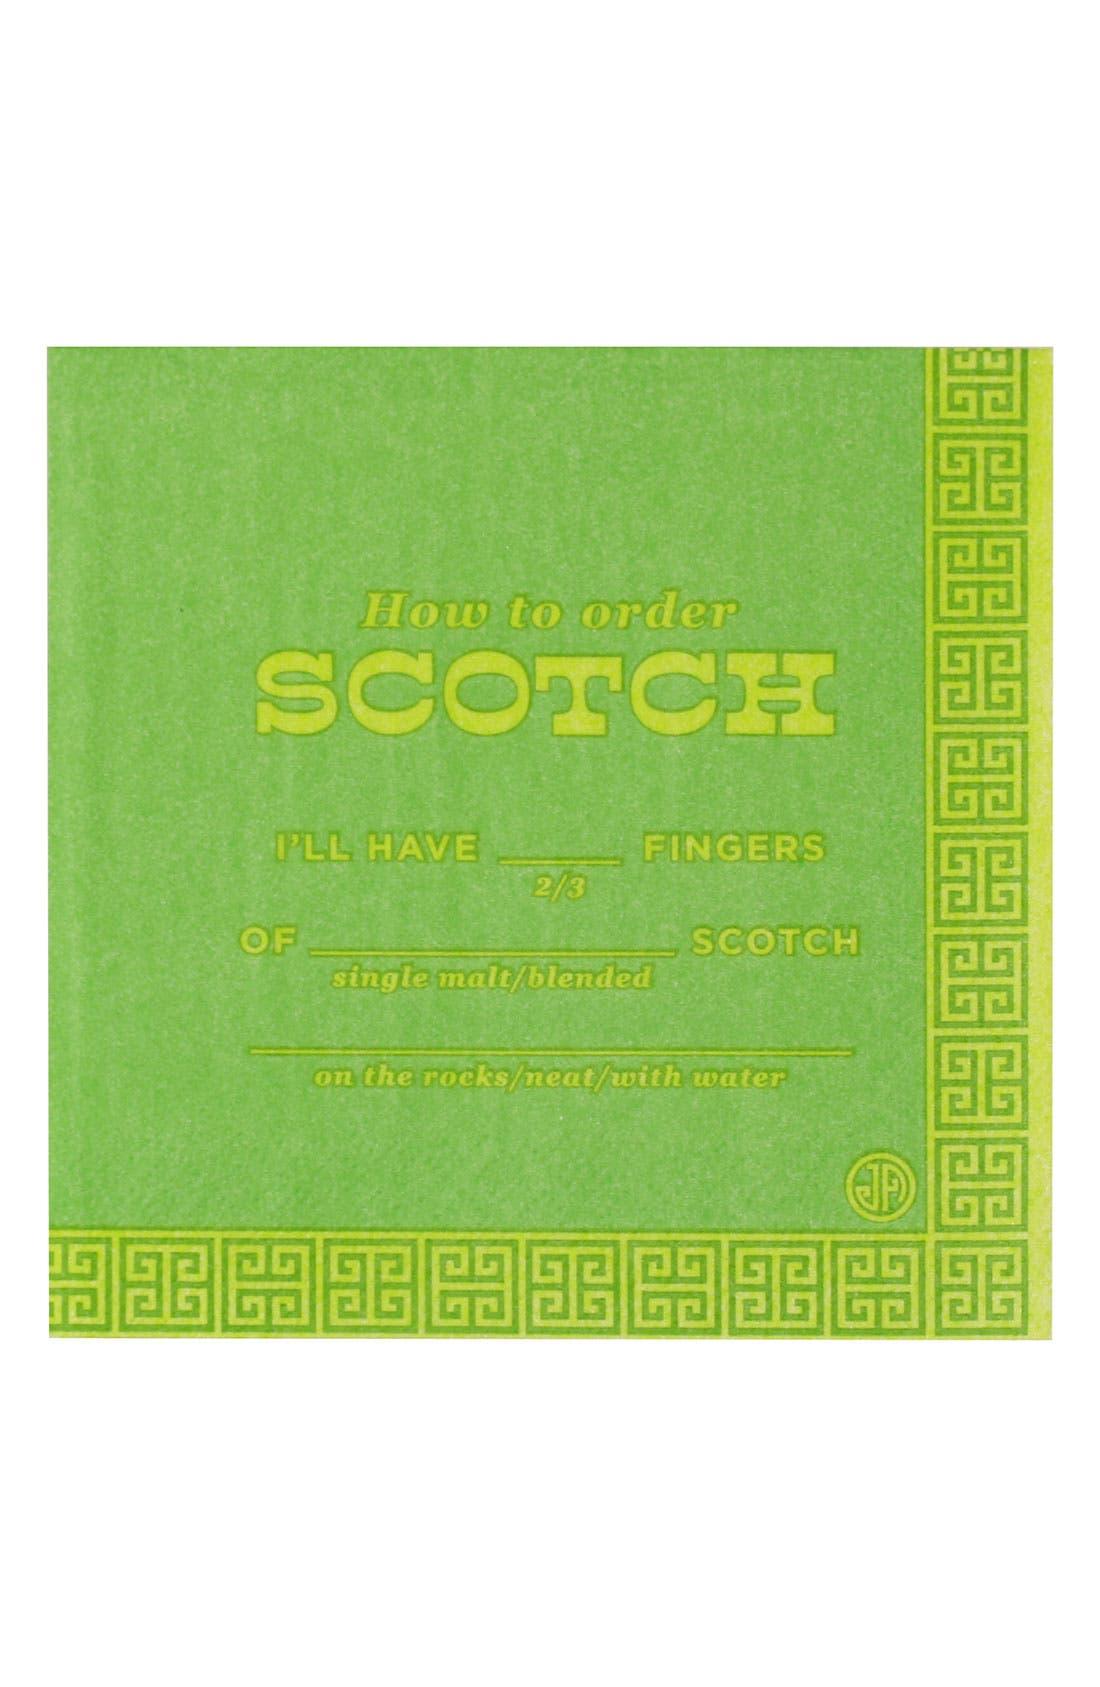 Alternate Image 1 Selected - Jonathan Adler 'Scotch' Cocktail Napkins